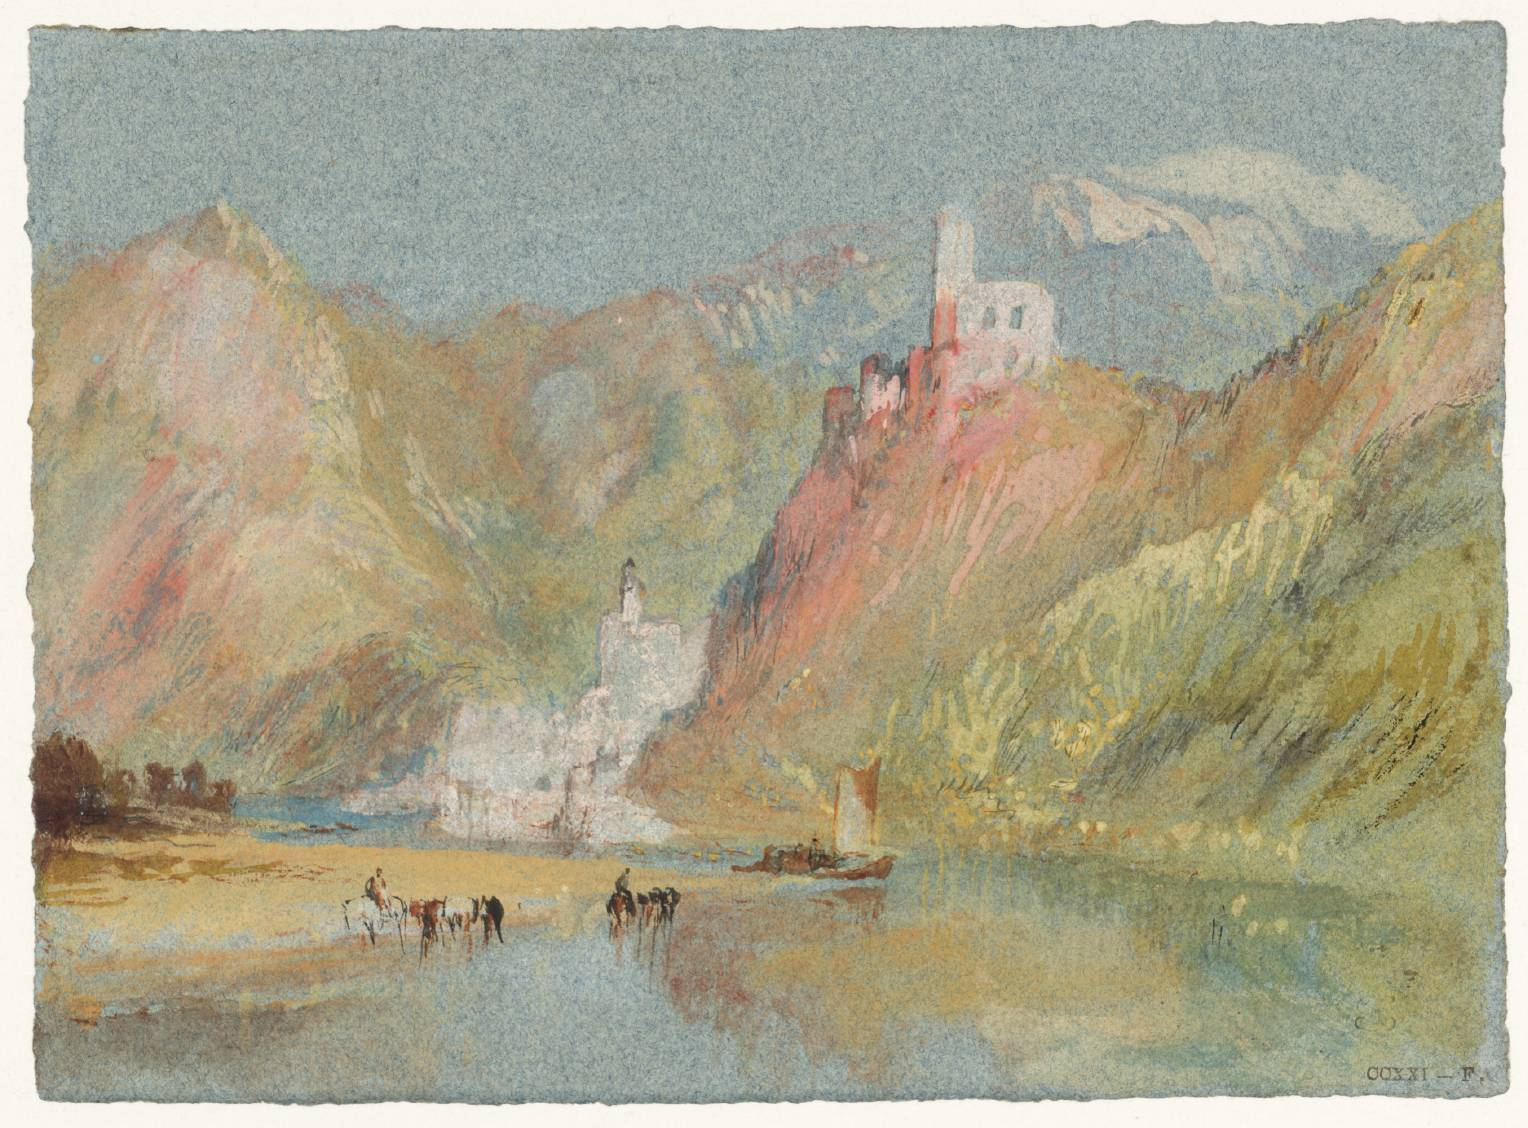 historia-técnica-acuarela-William-Turner-Beilstein-Castillo-Metternich